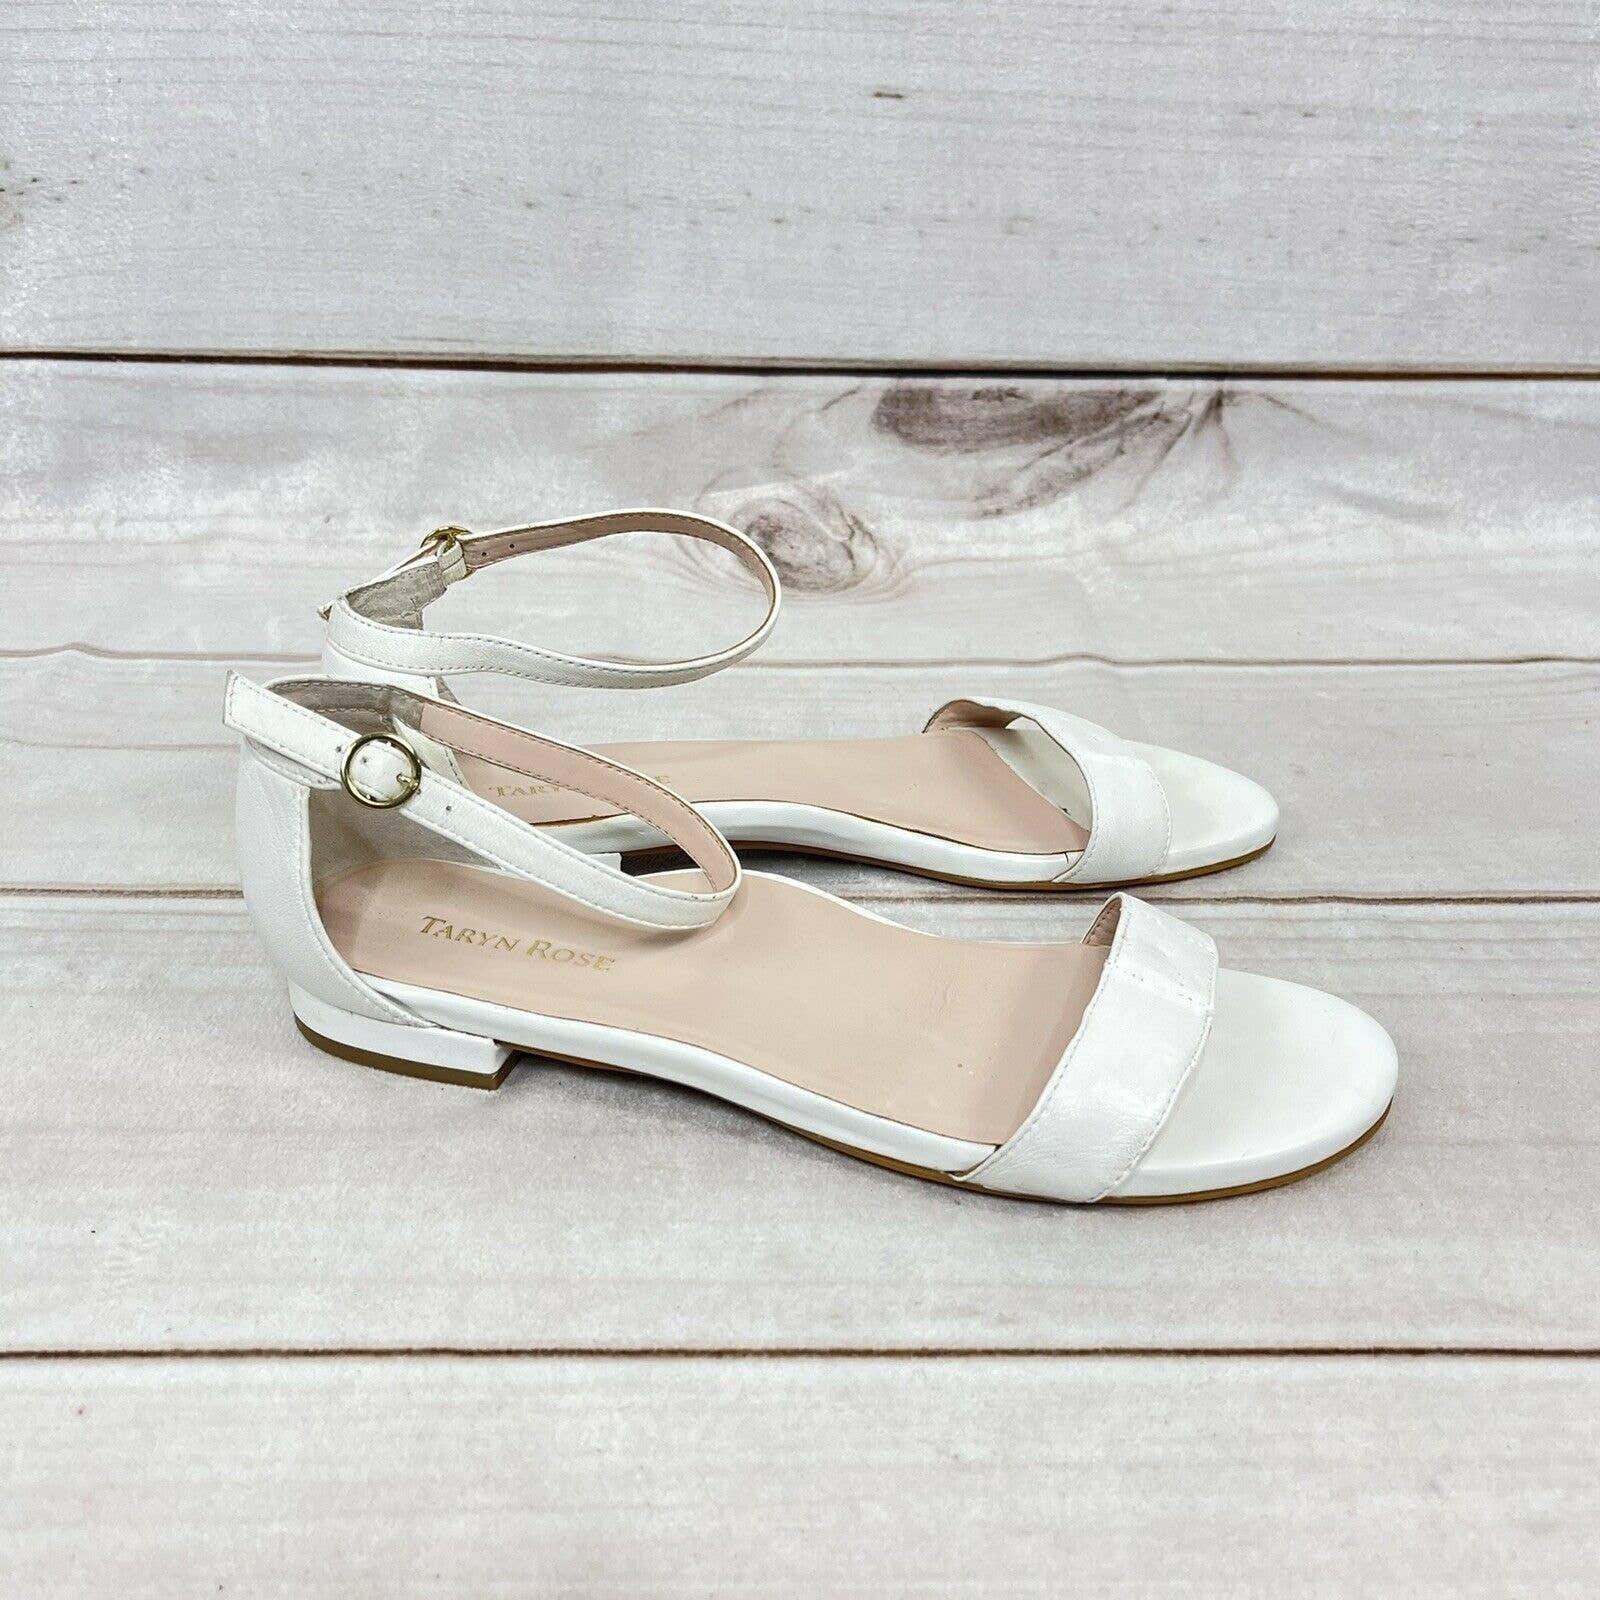 Taryn Rose Ankle Strap Sandal